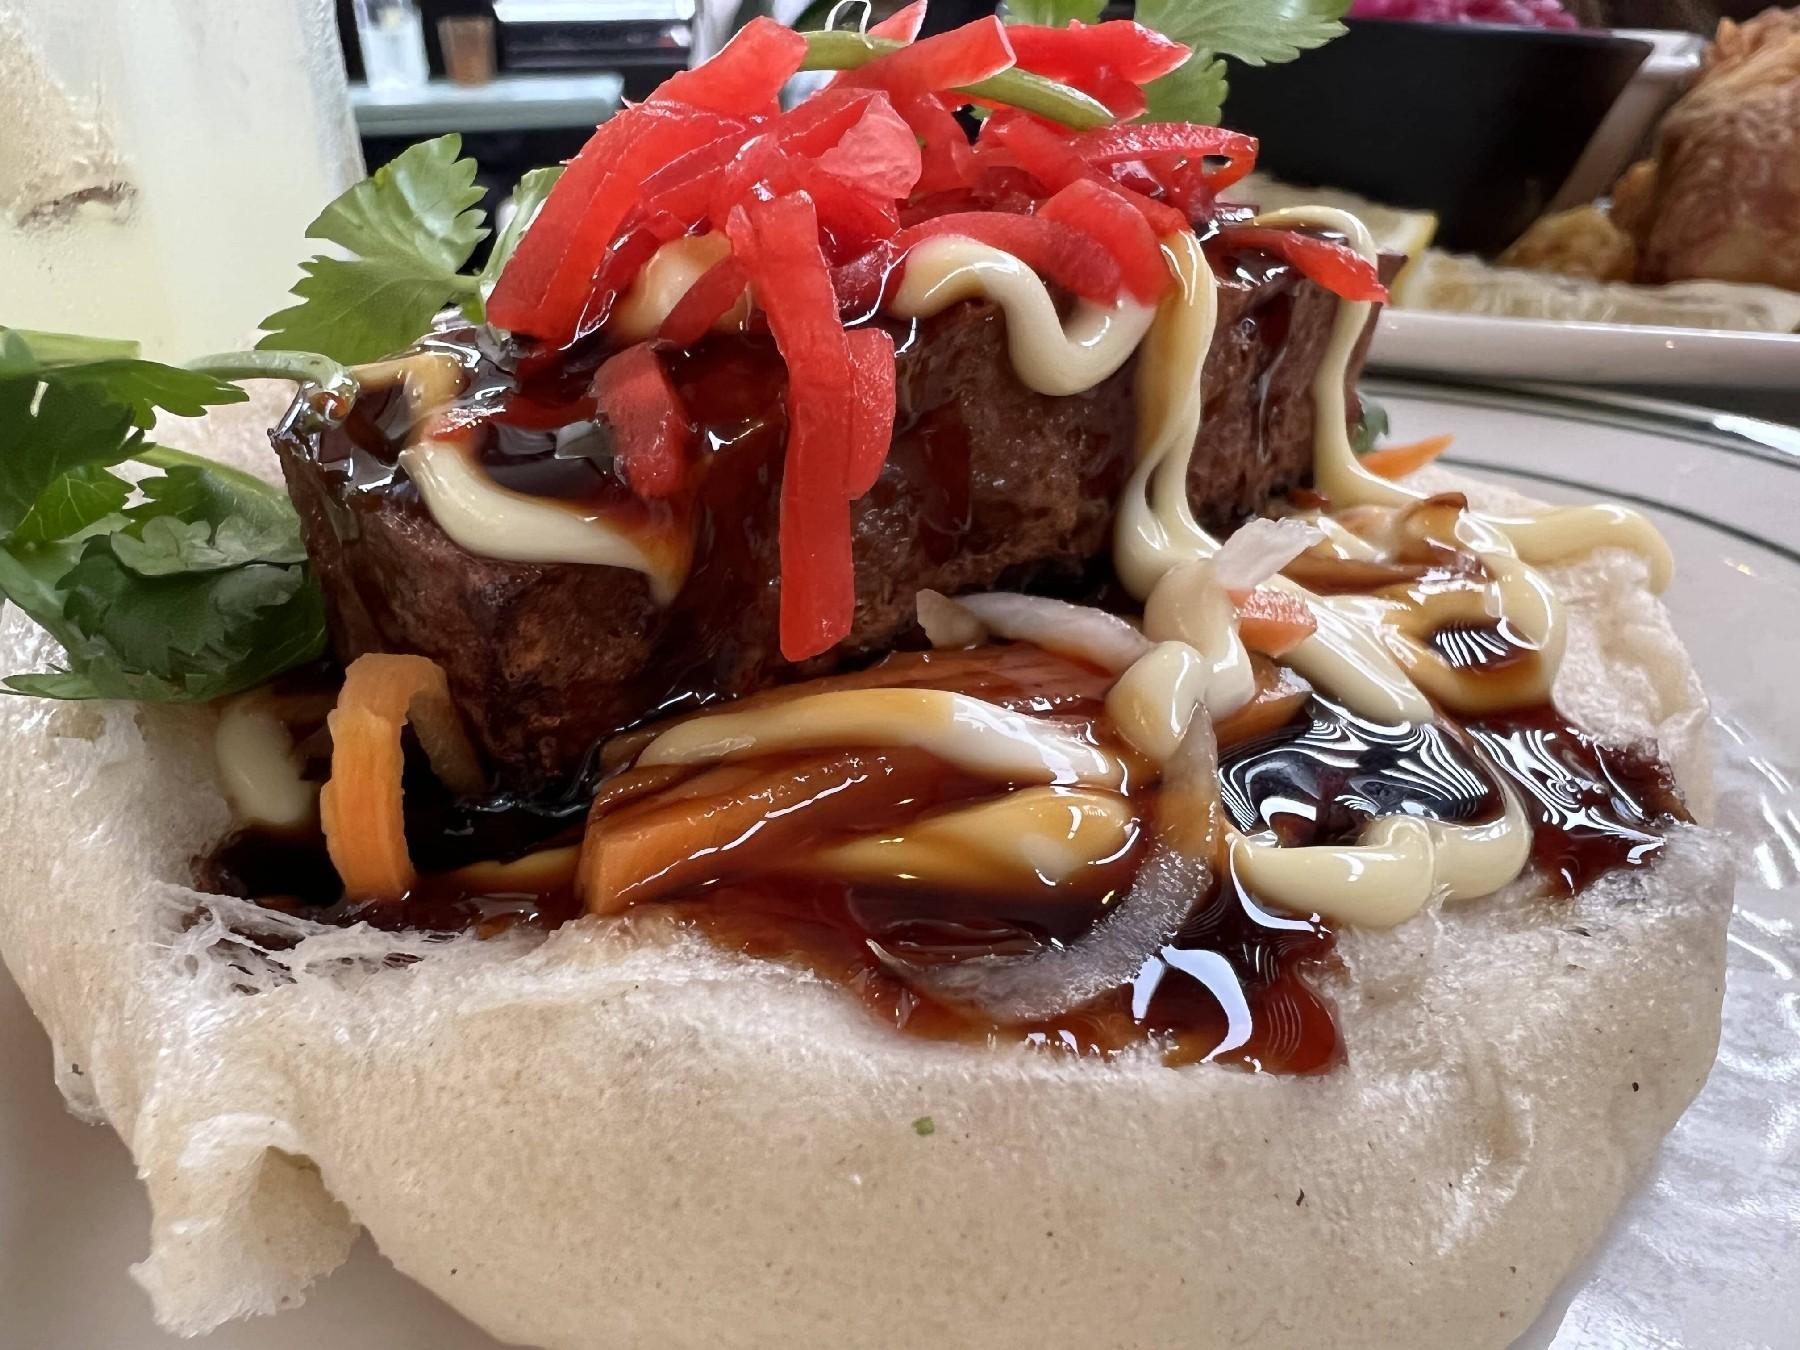 <p>iPhone 13 Pro camera sample: Mayonnaise, cilantro, sweet dark sauce dripping down a piece of blackened tofu on a white bun.</p>